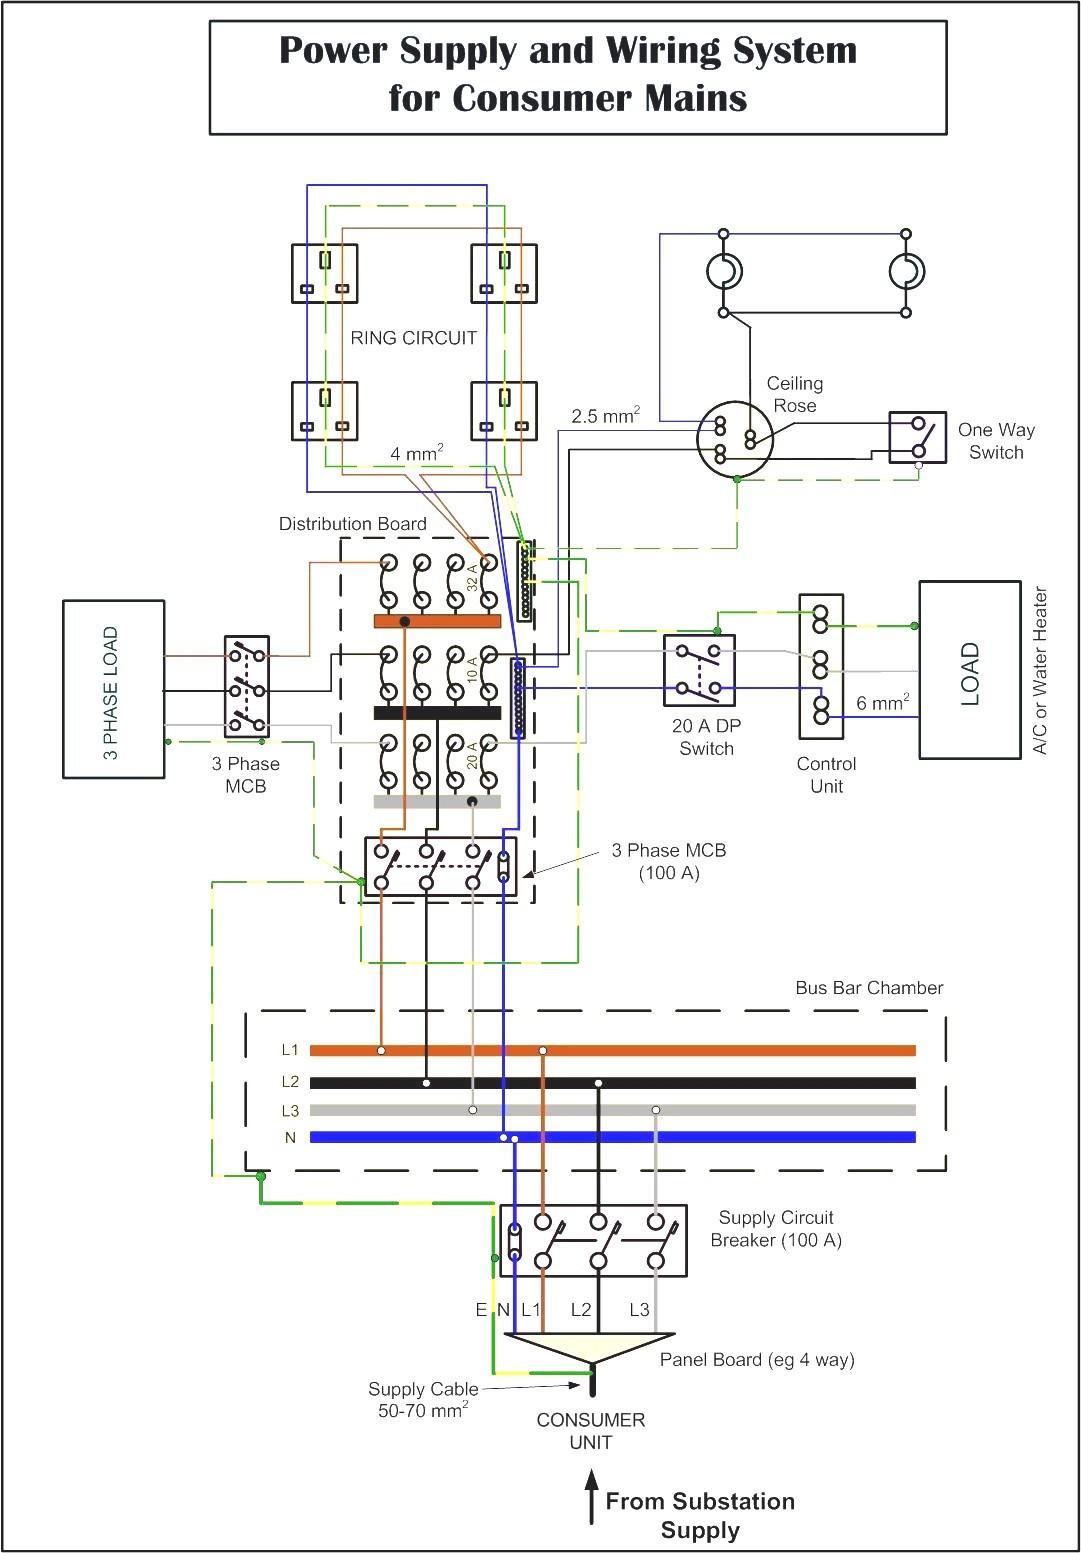 Residential Electrical Wiring Diagram Fresh Kitchen Electrical Wiring Diagram Canopi